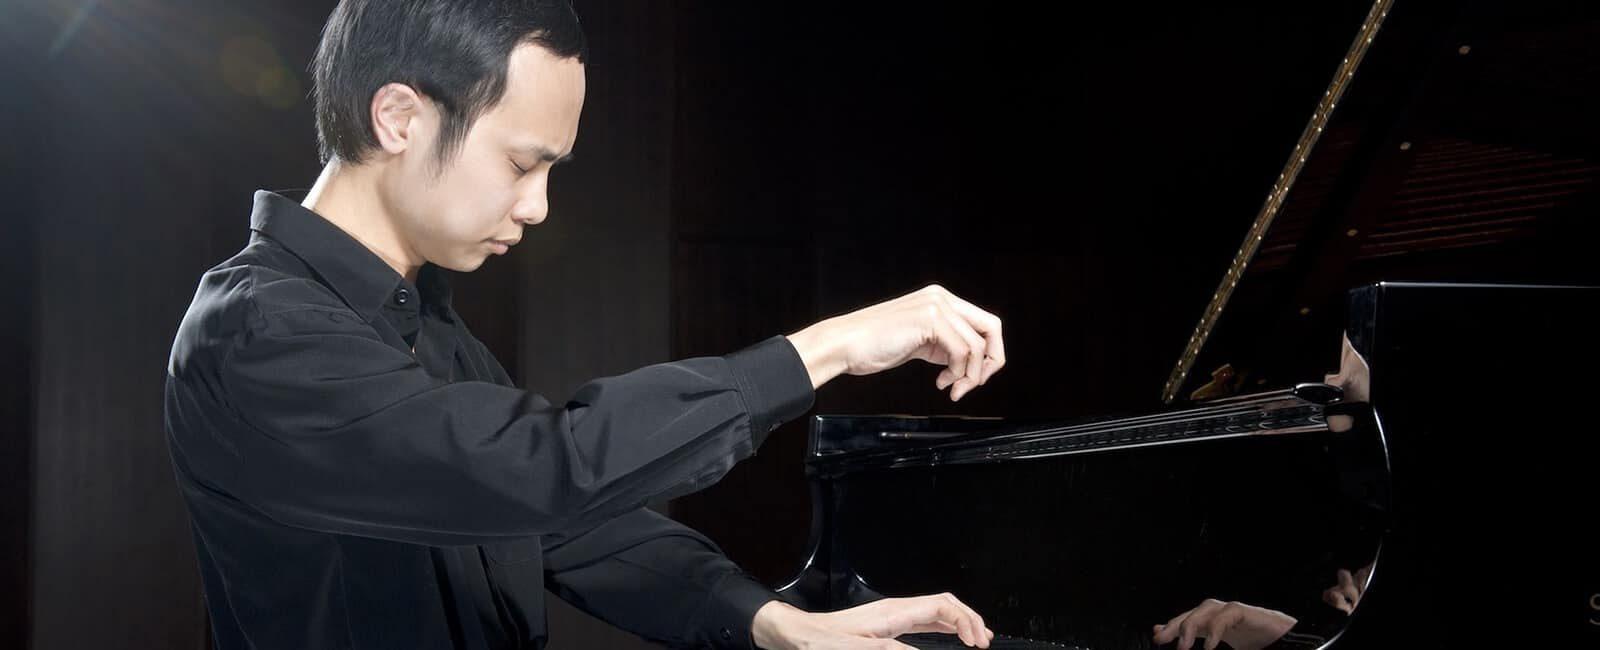 Nicholas Young - Pianist - bio